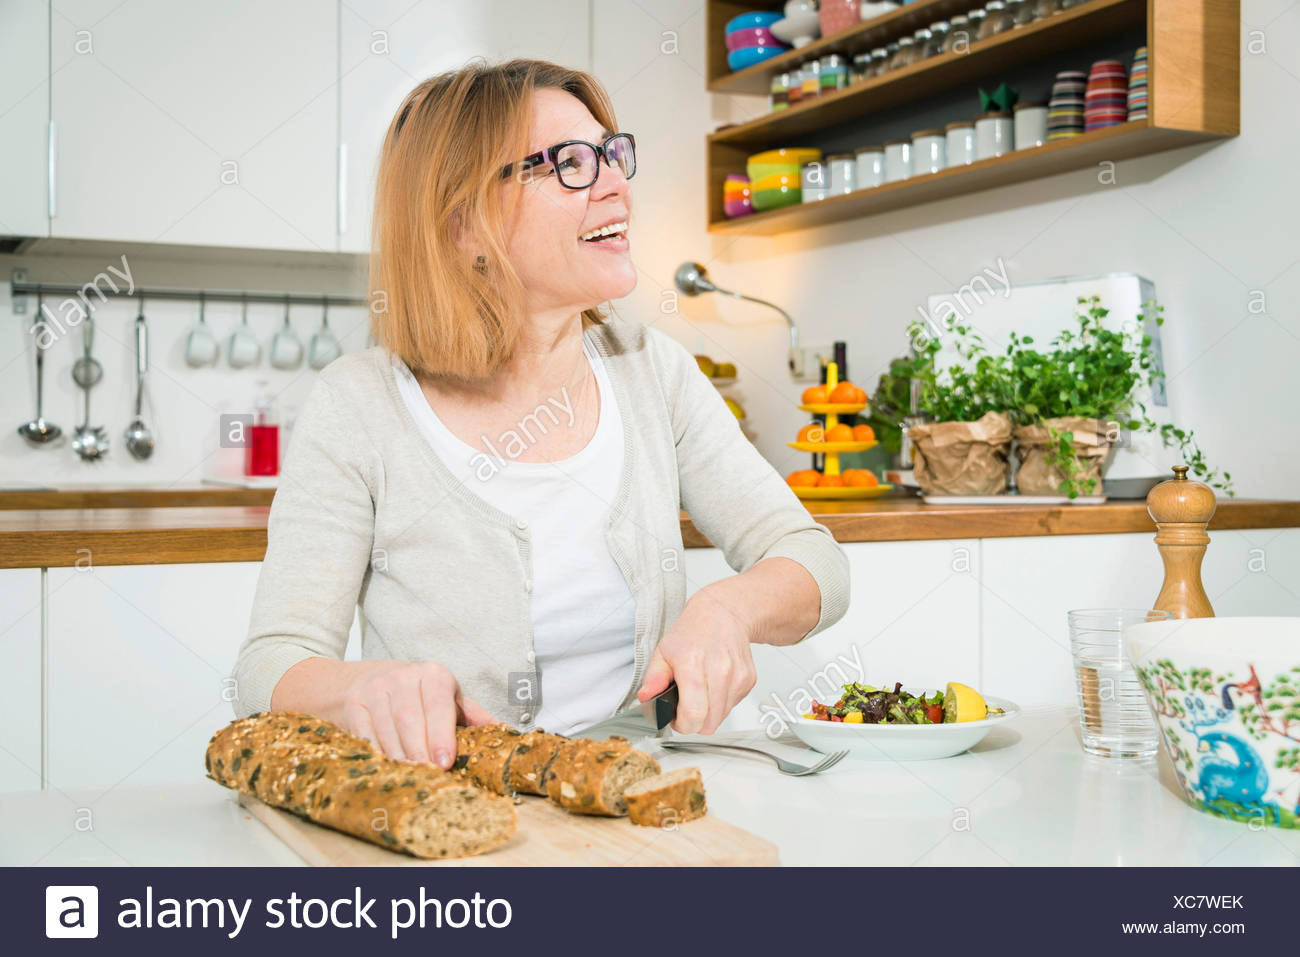 Senior woman cutting bread - Stock Image